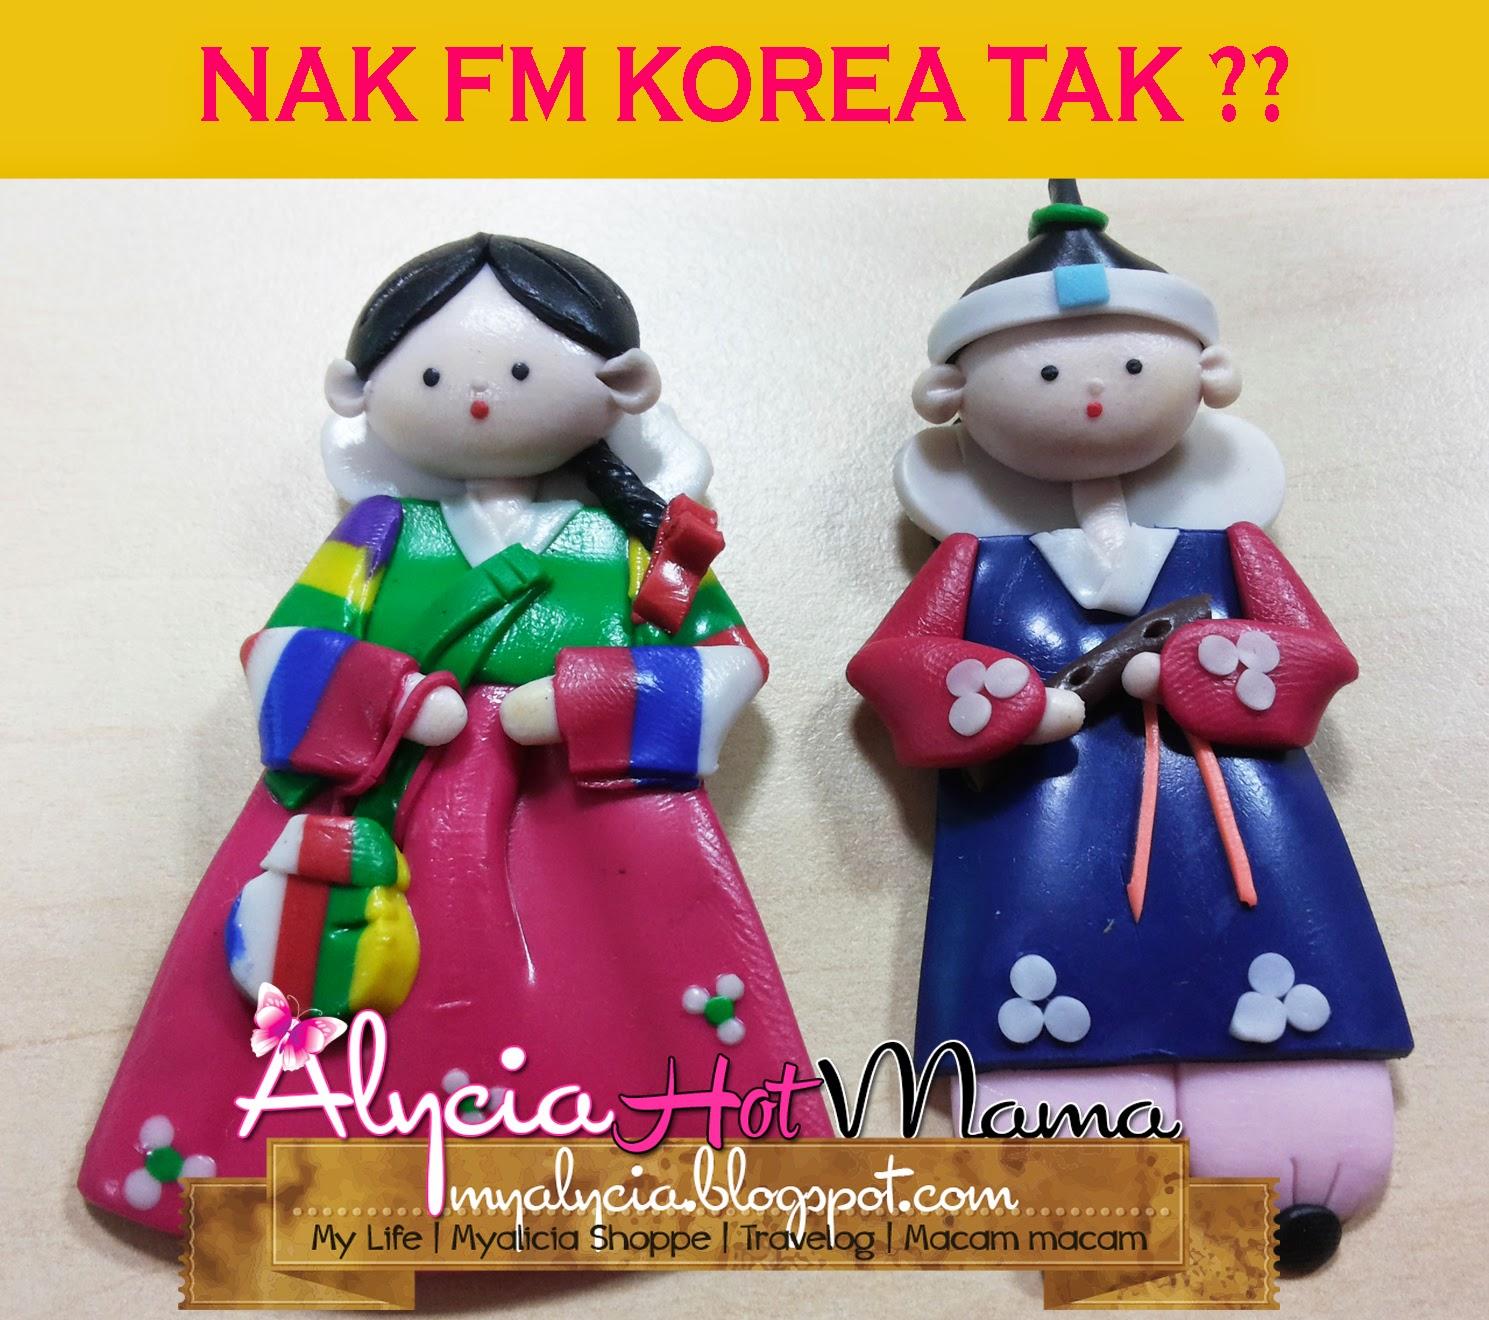 http://myalycia.blogspot.com/2014/04/siapa-nak-fm-korea.html